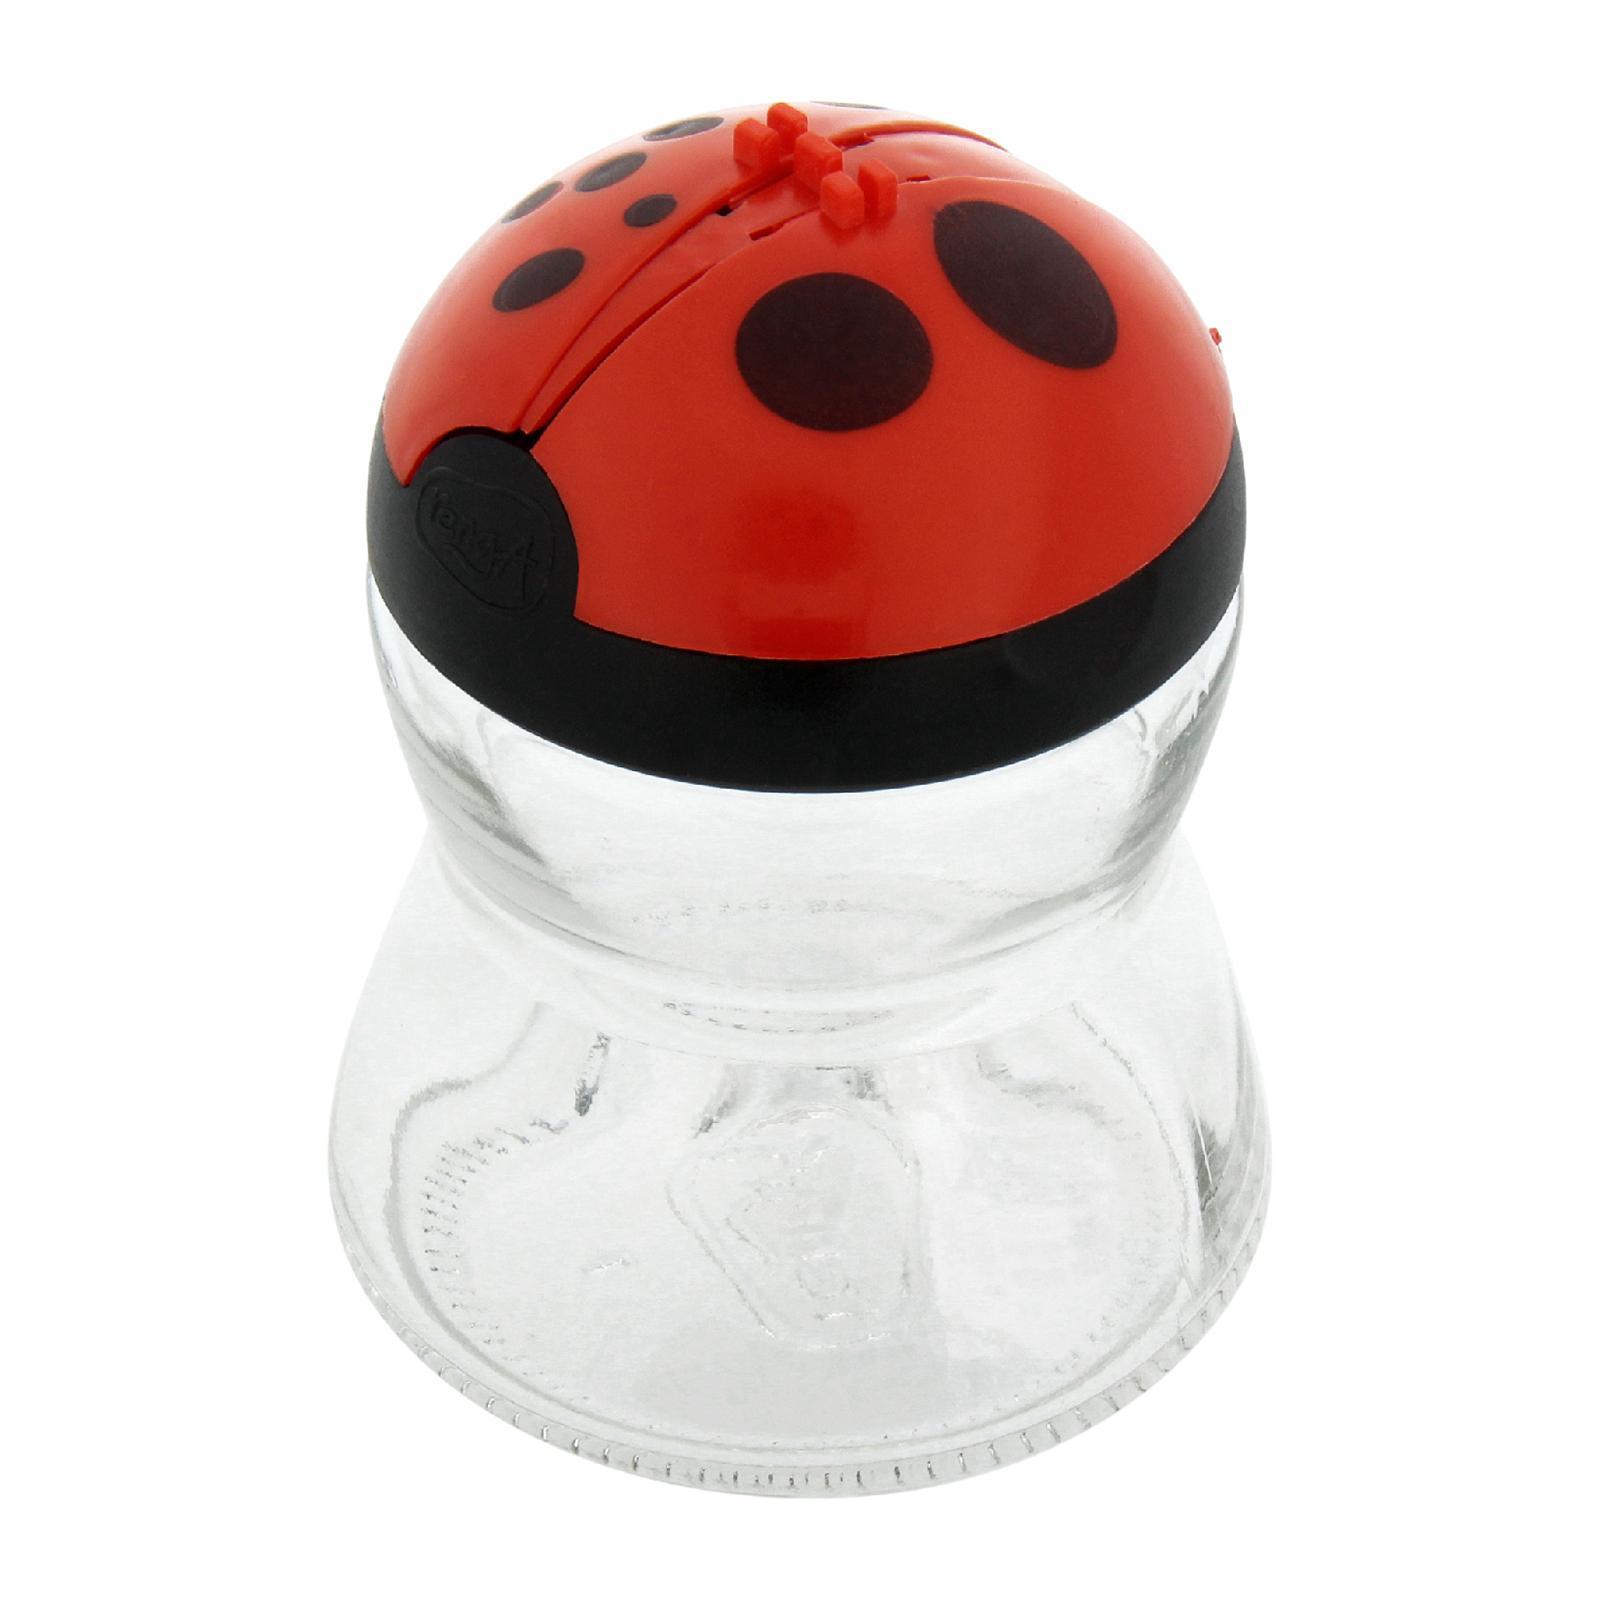 Renga Ladybug Glass Spice And Cheese Shaker Jar 200 ML (Red)